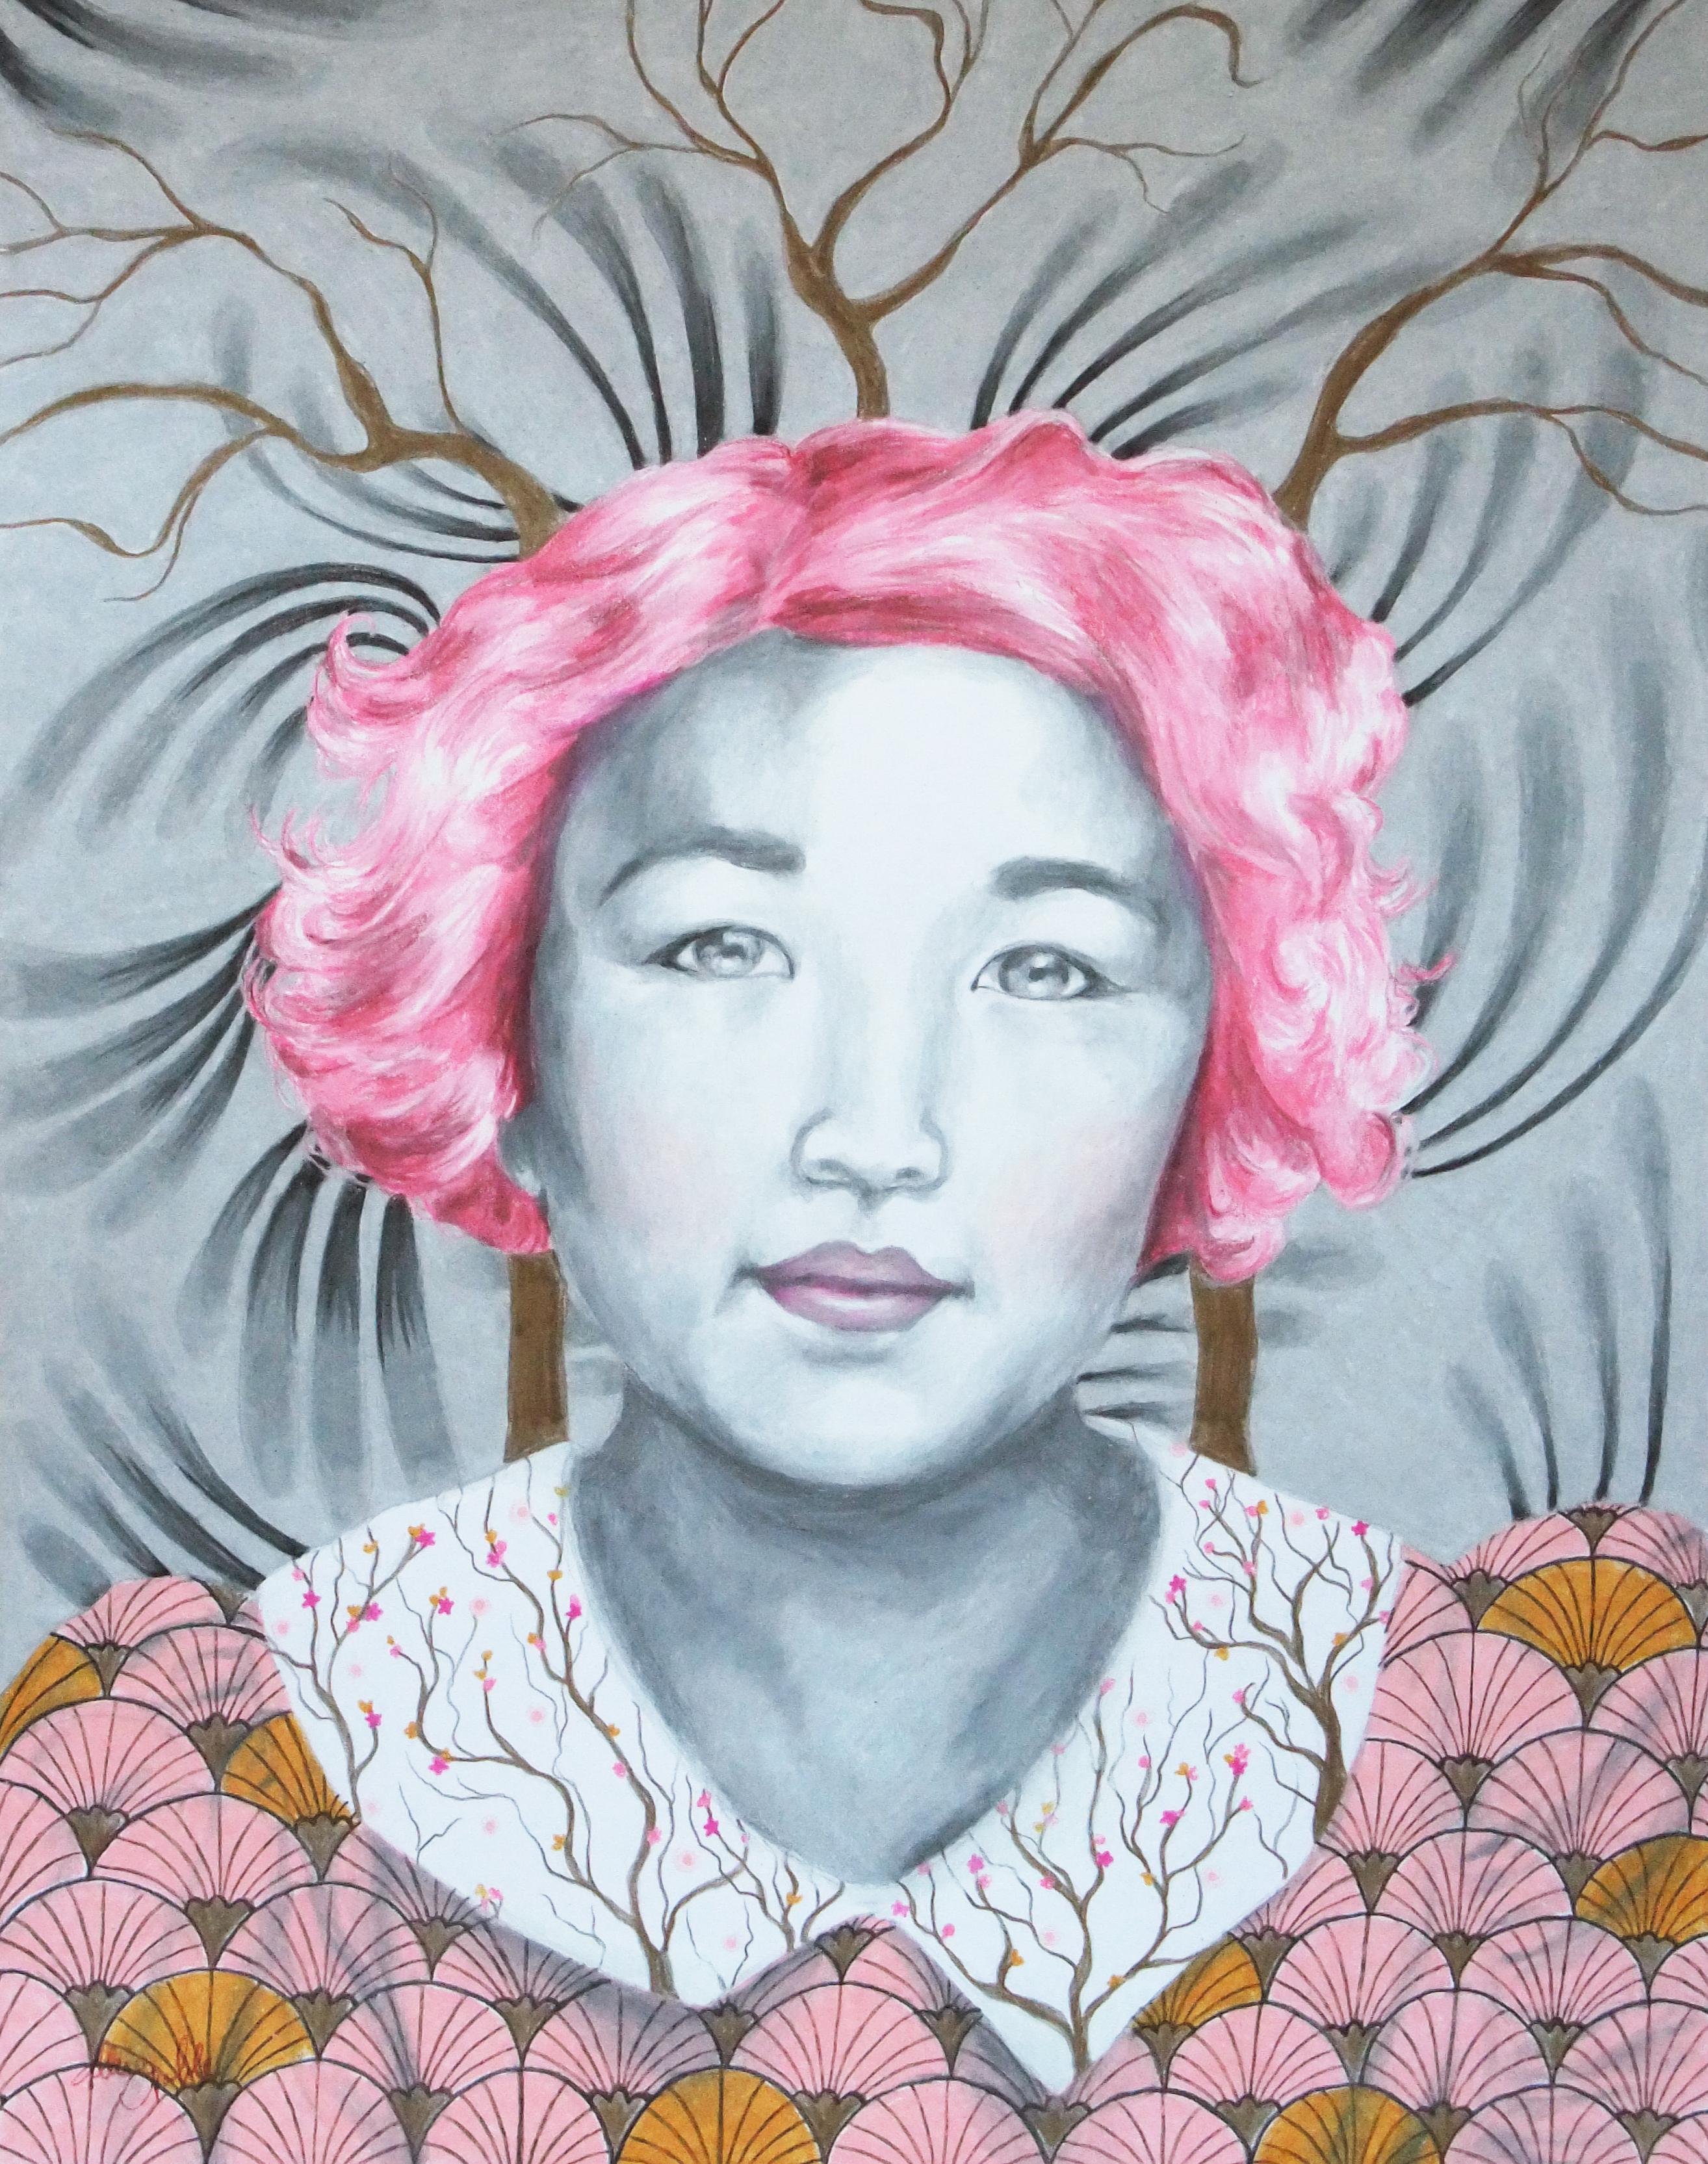 March 2015 Allise Nicole S Artistic Explorations